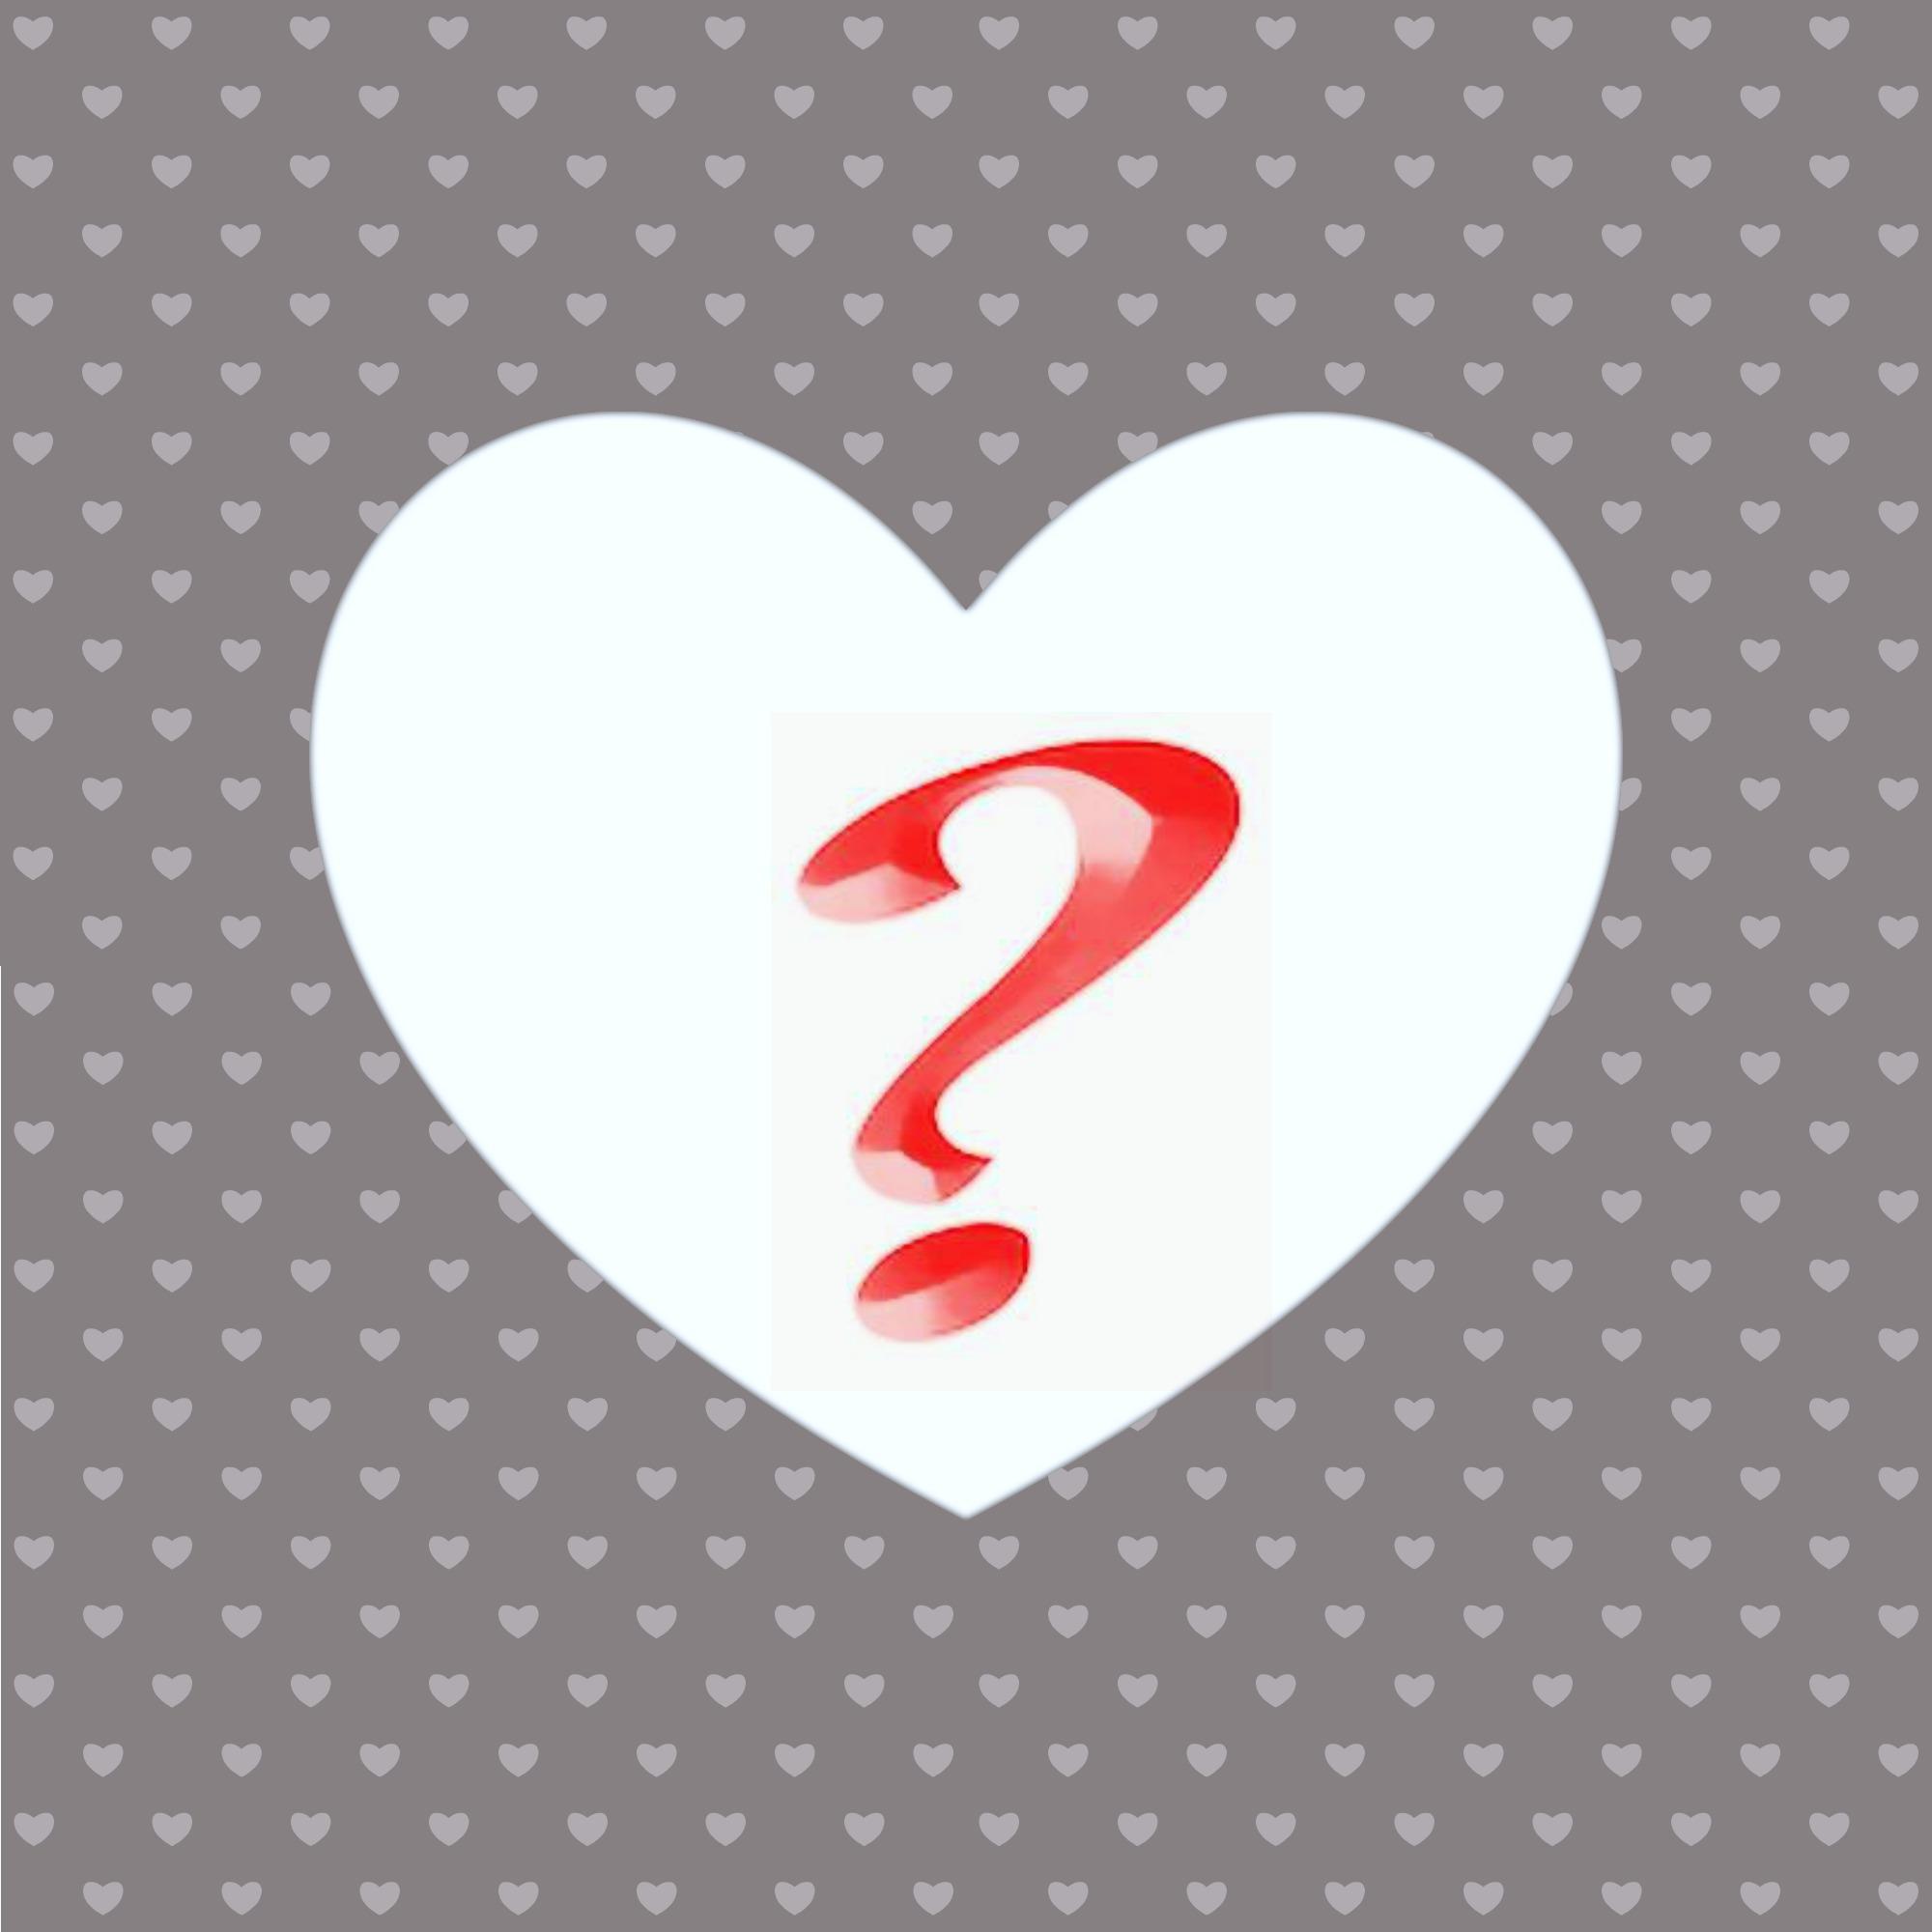 HEART QUESTION MARK